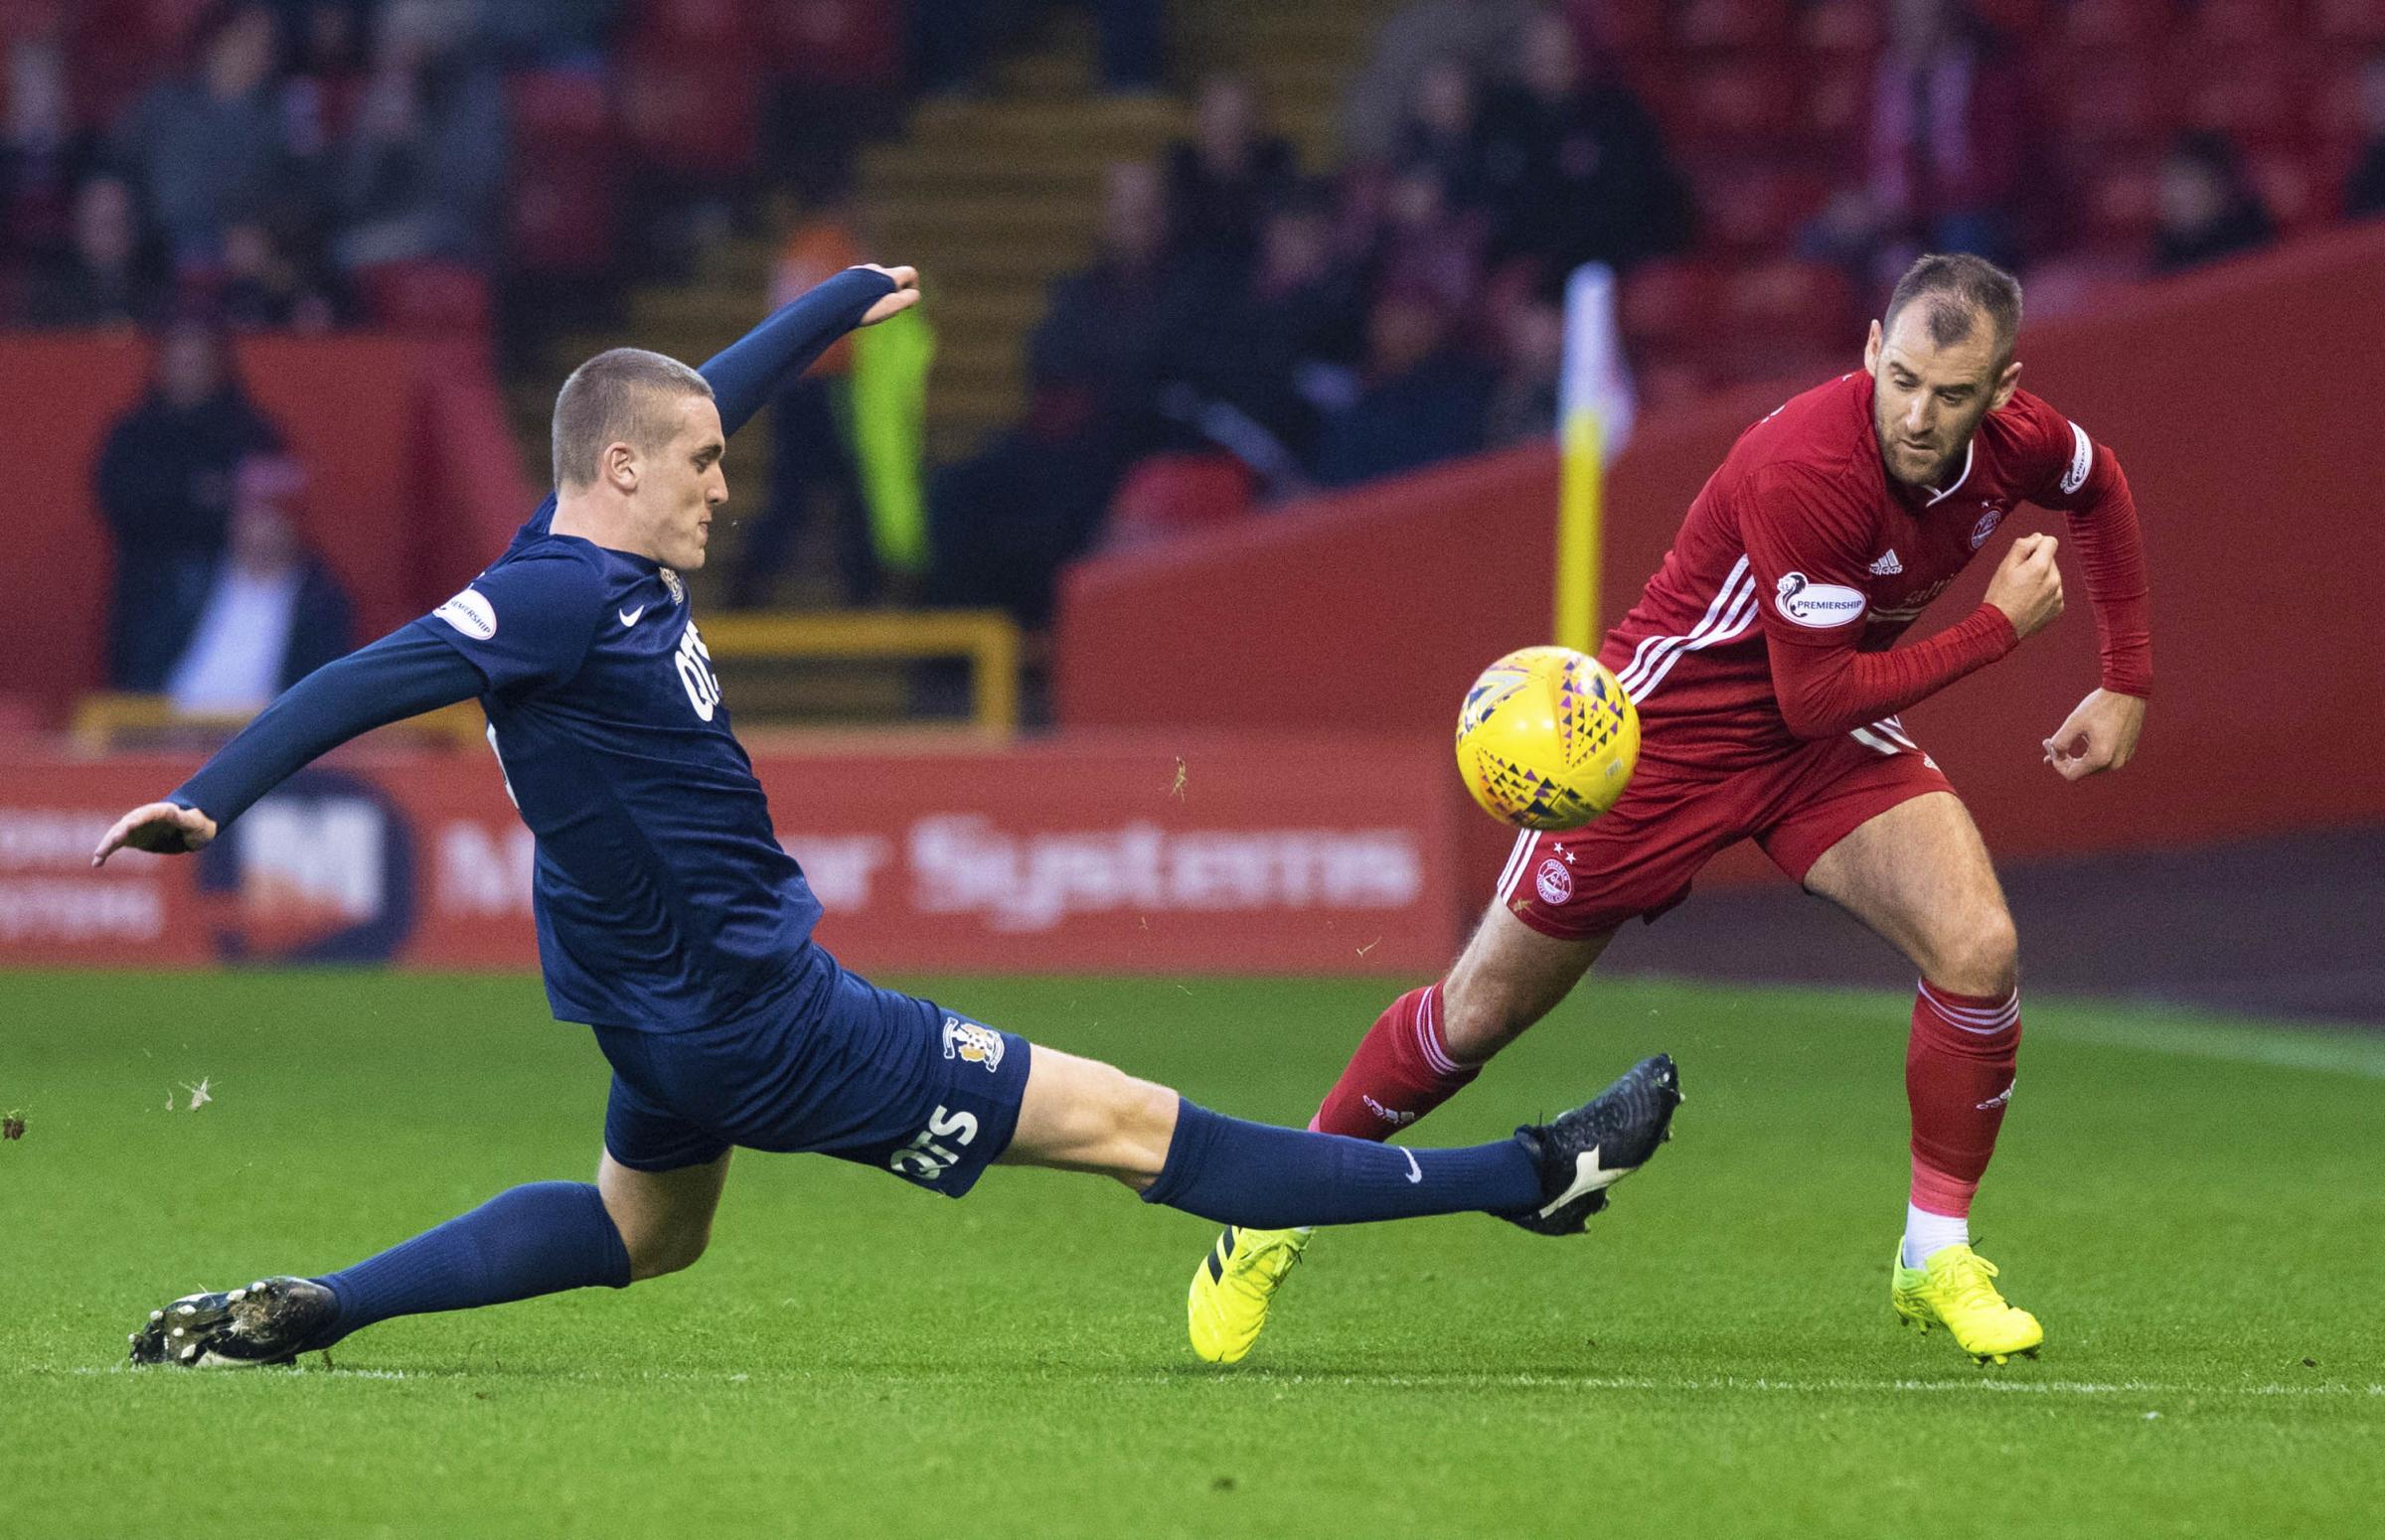 Kilmarnock's Iain Wilson: No excuses for Aberdeen loss